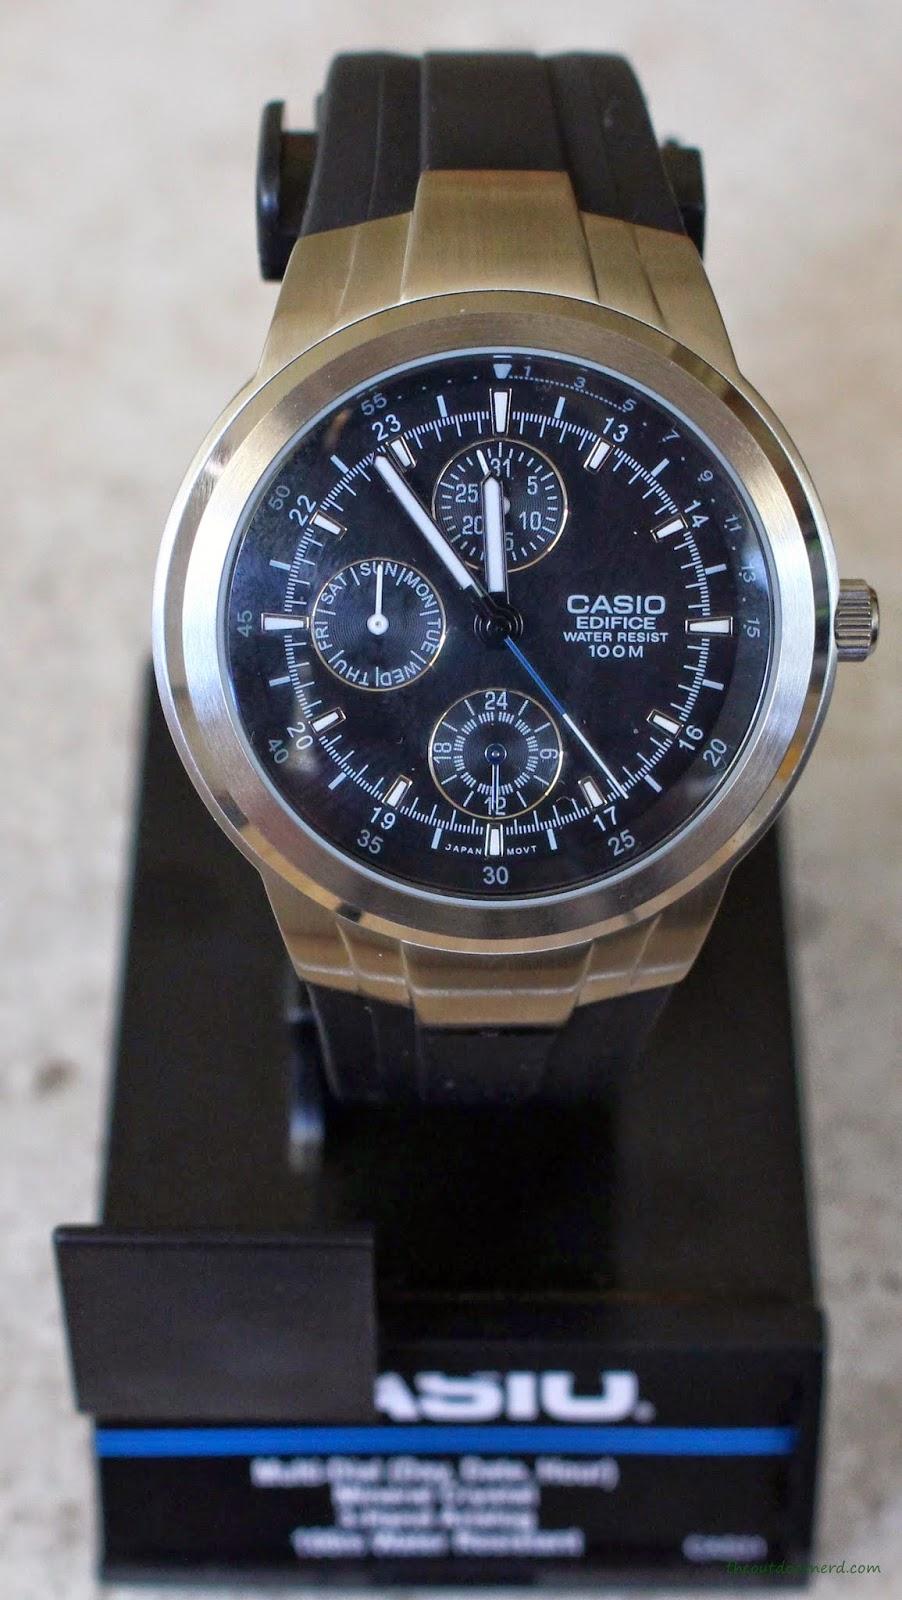 Casio Men's EF305-1AV Edifice Watch Product Link